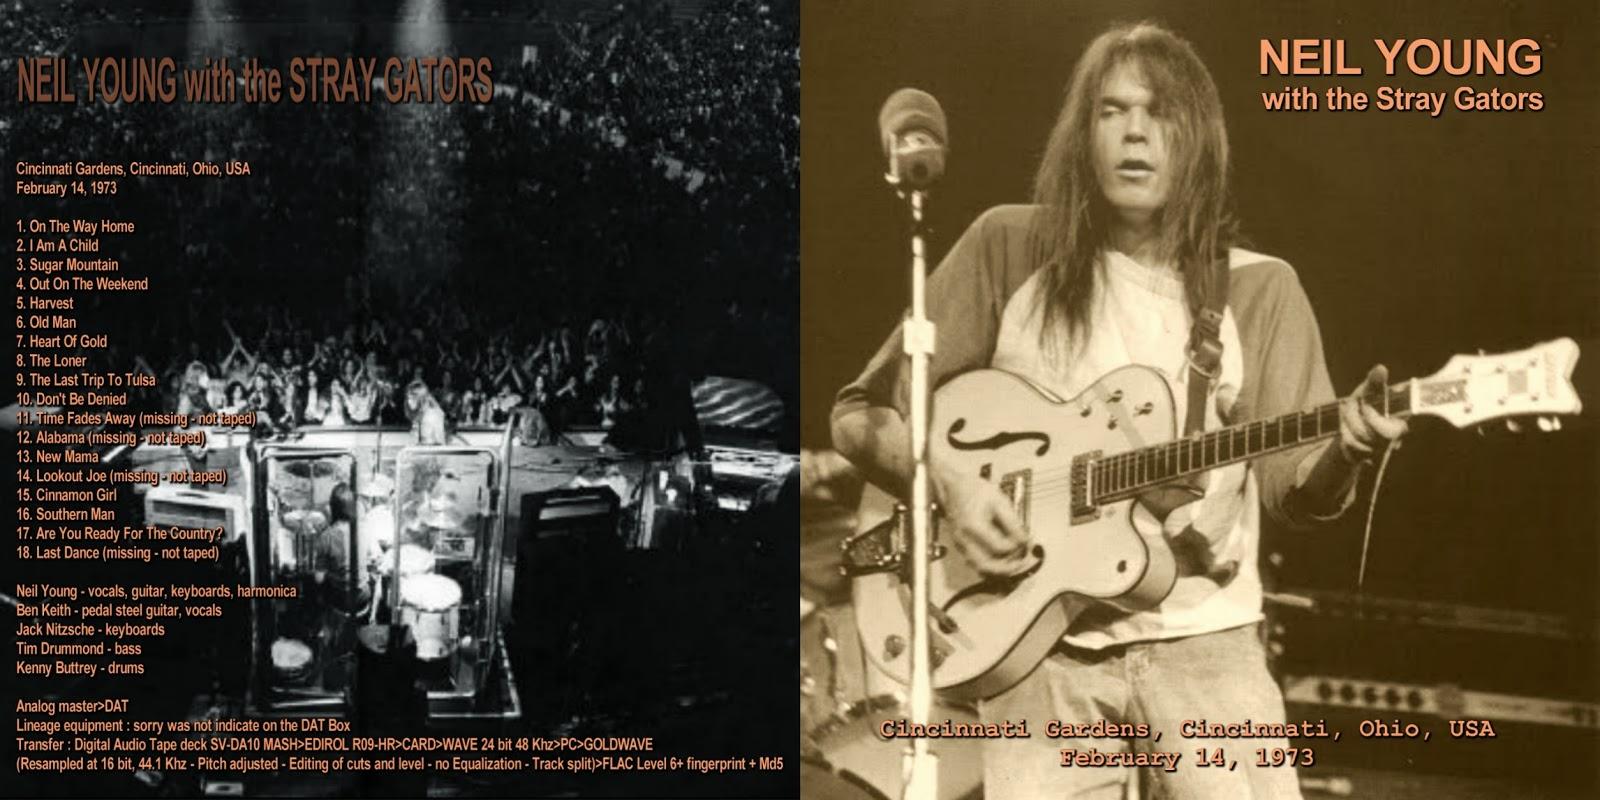 PLUMDUSTY'S PAGE: Neil Young 1973-02-14 Cincinnati Gardens ...